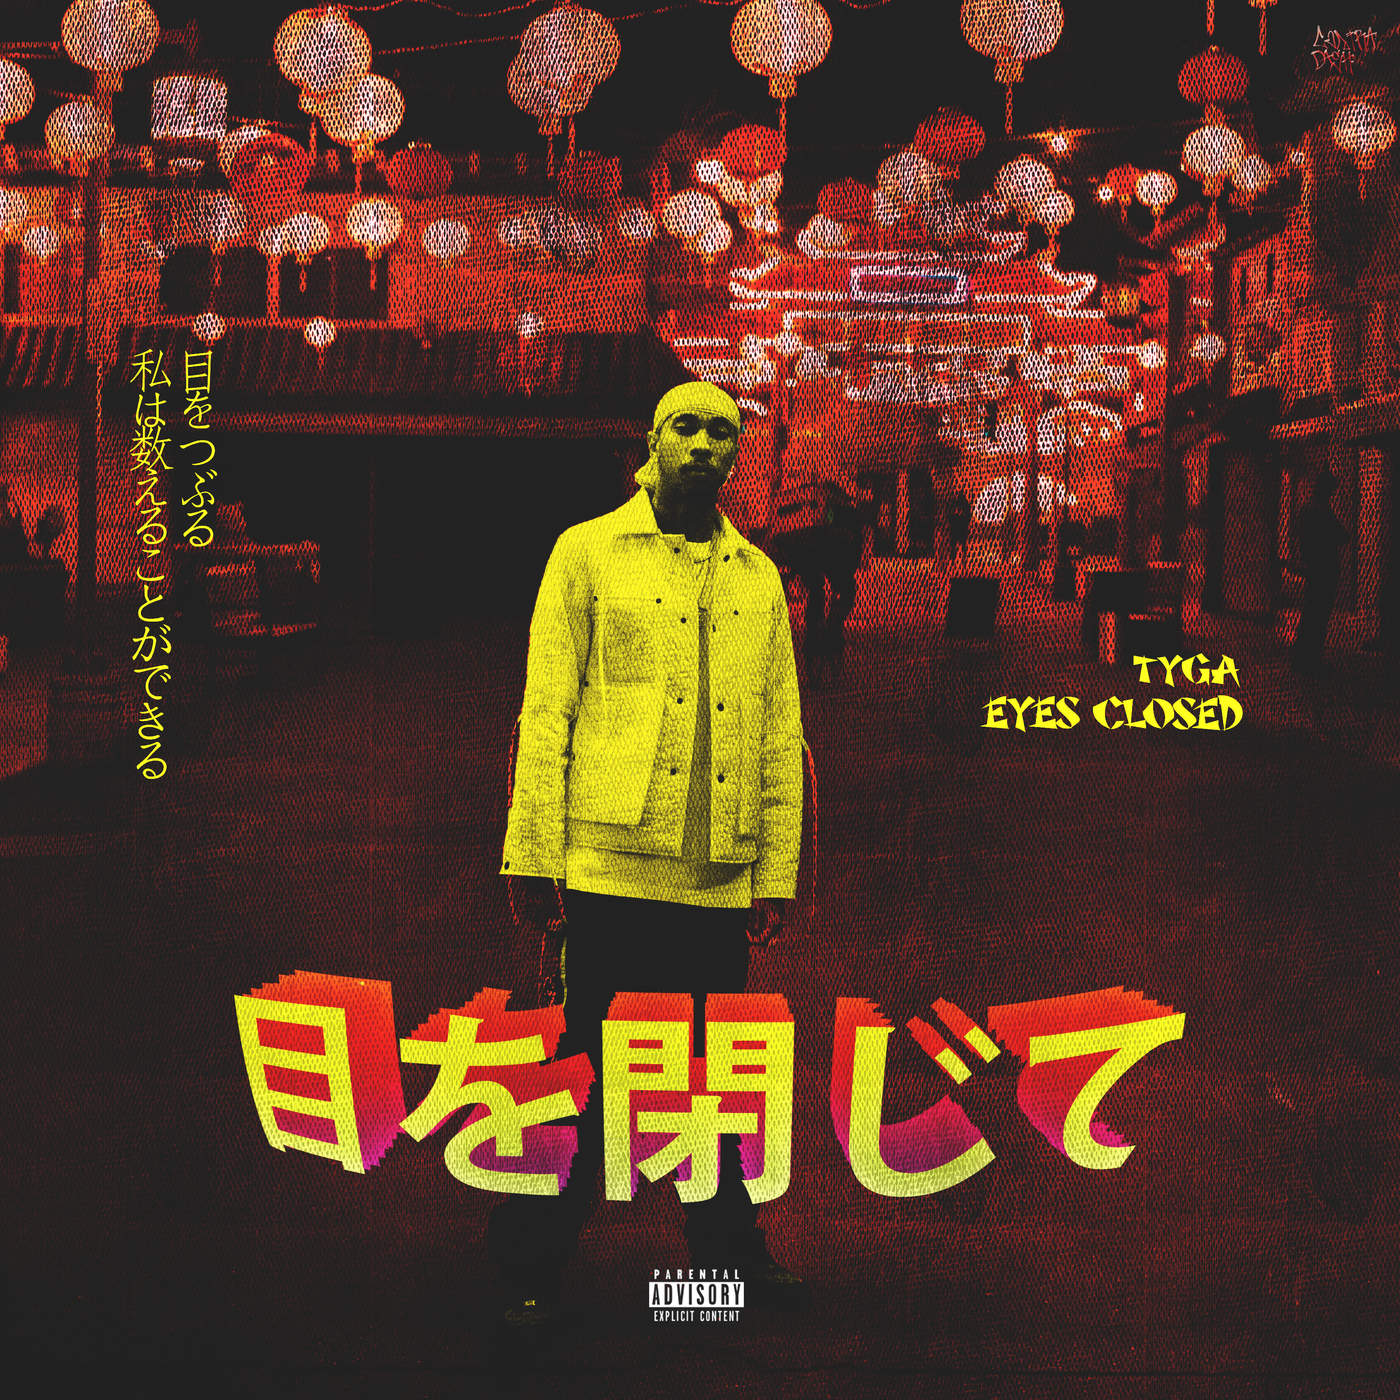 Tyga - Eyes Closed - Single Cover